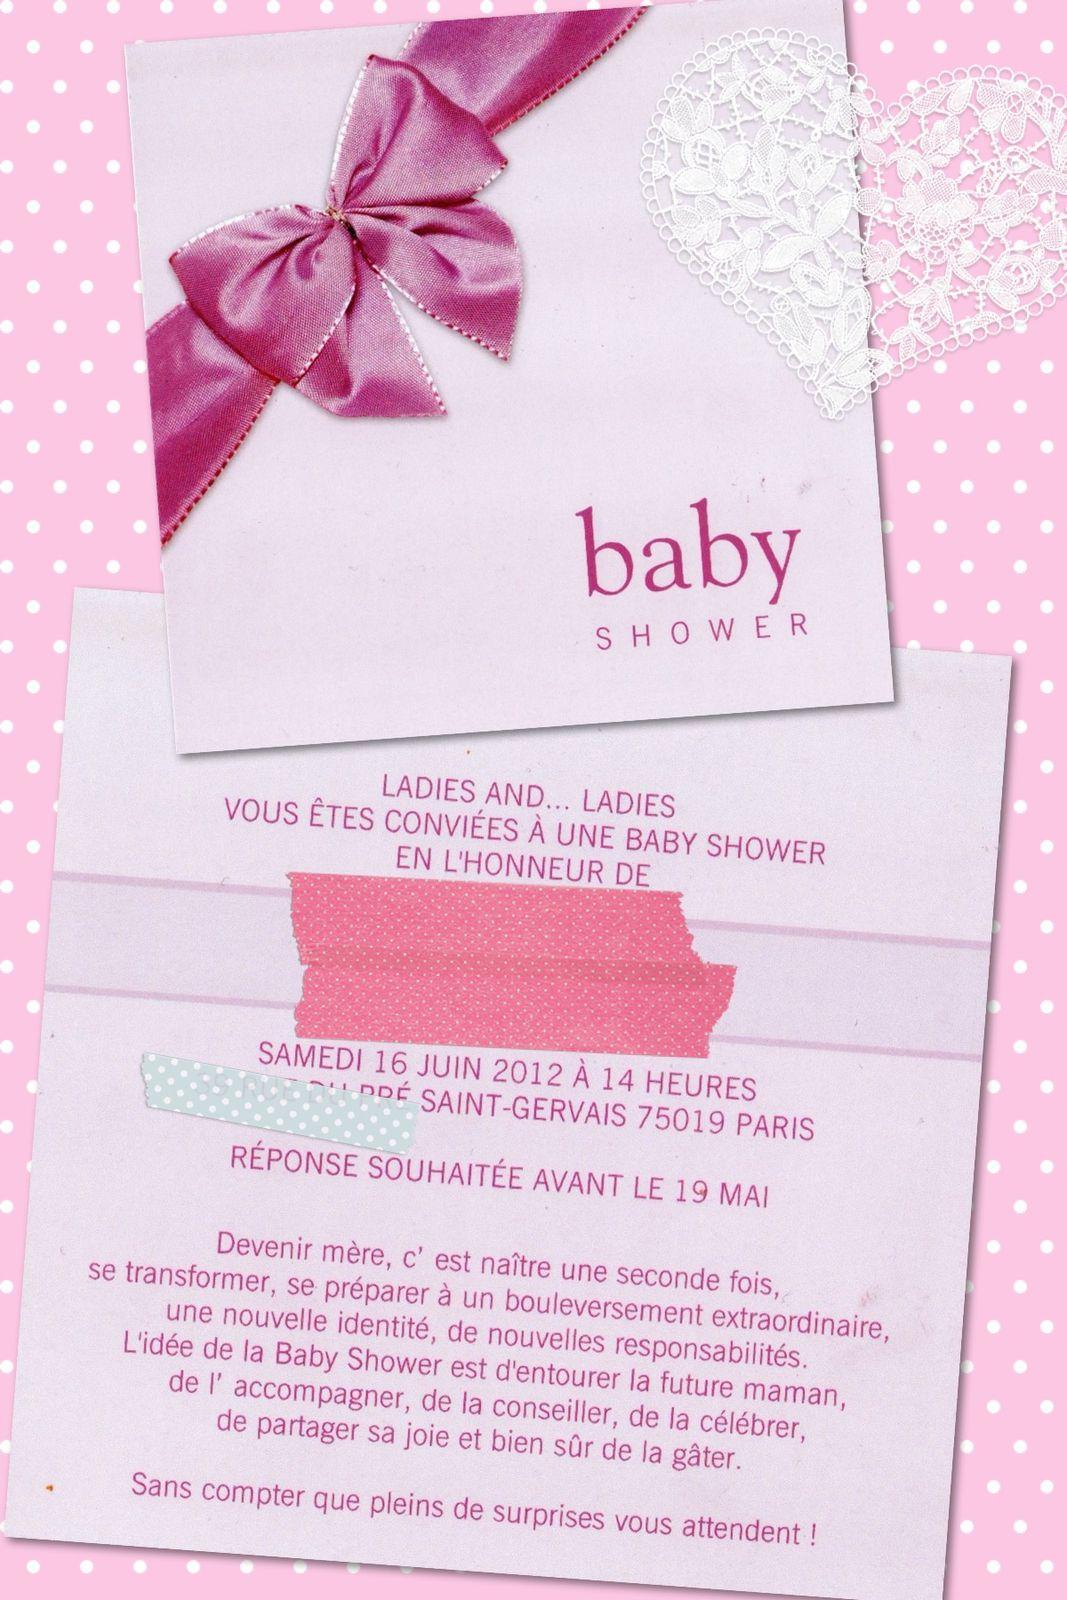 Baby Shower Cadeau Futur Maman flash-back # 1 - ma baby-shower - mère veilleuse